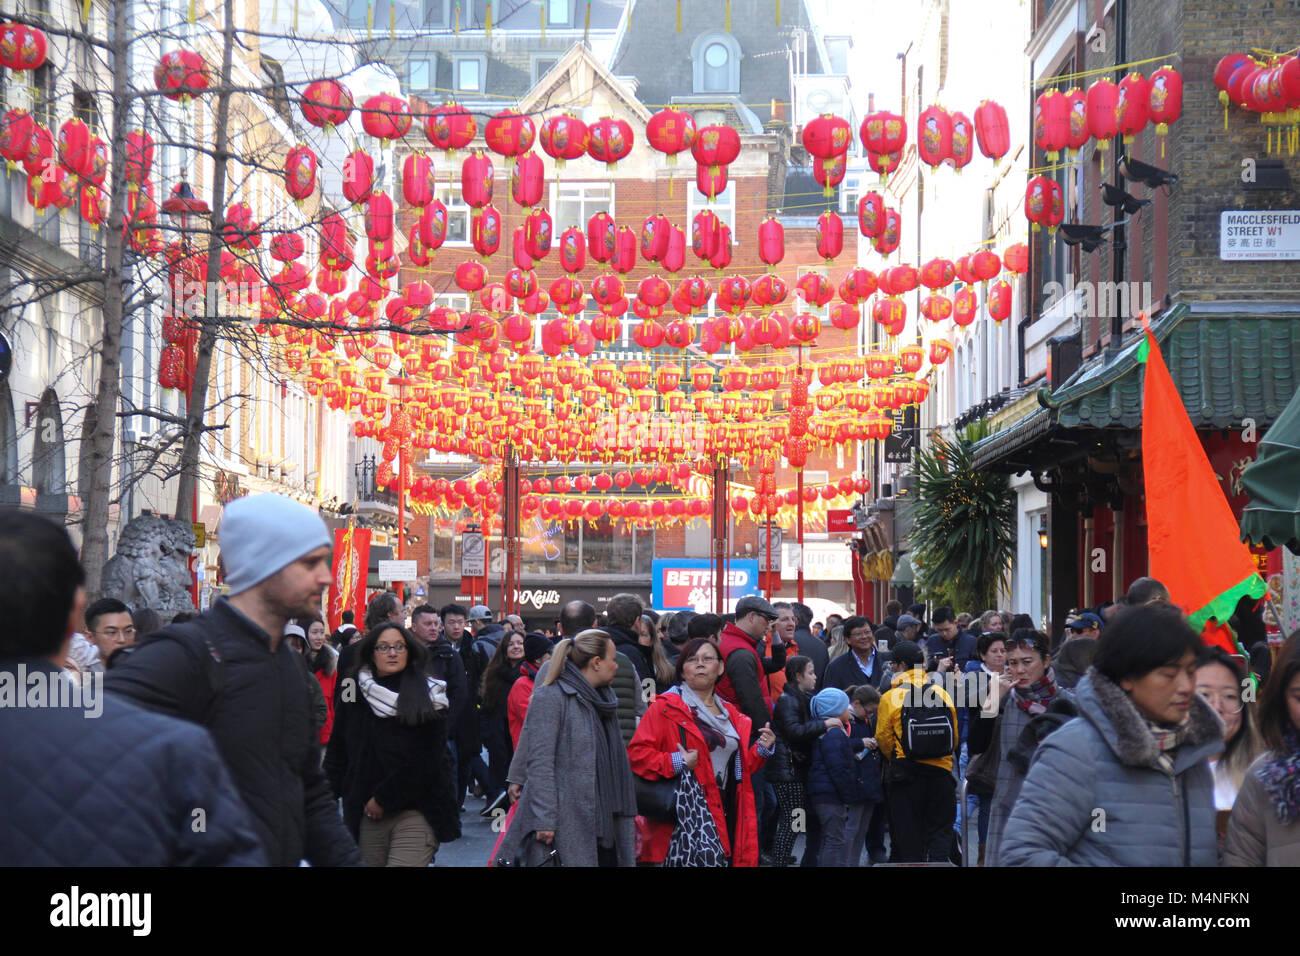 London, UK. 17th Feb, 2018. Londoners seen walking below Chinese lanterns in China Town London on 17 February 2018 - Stock Image